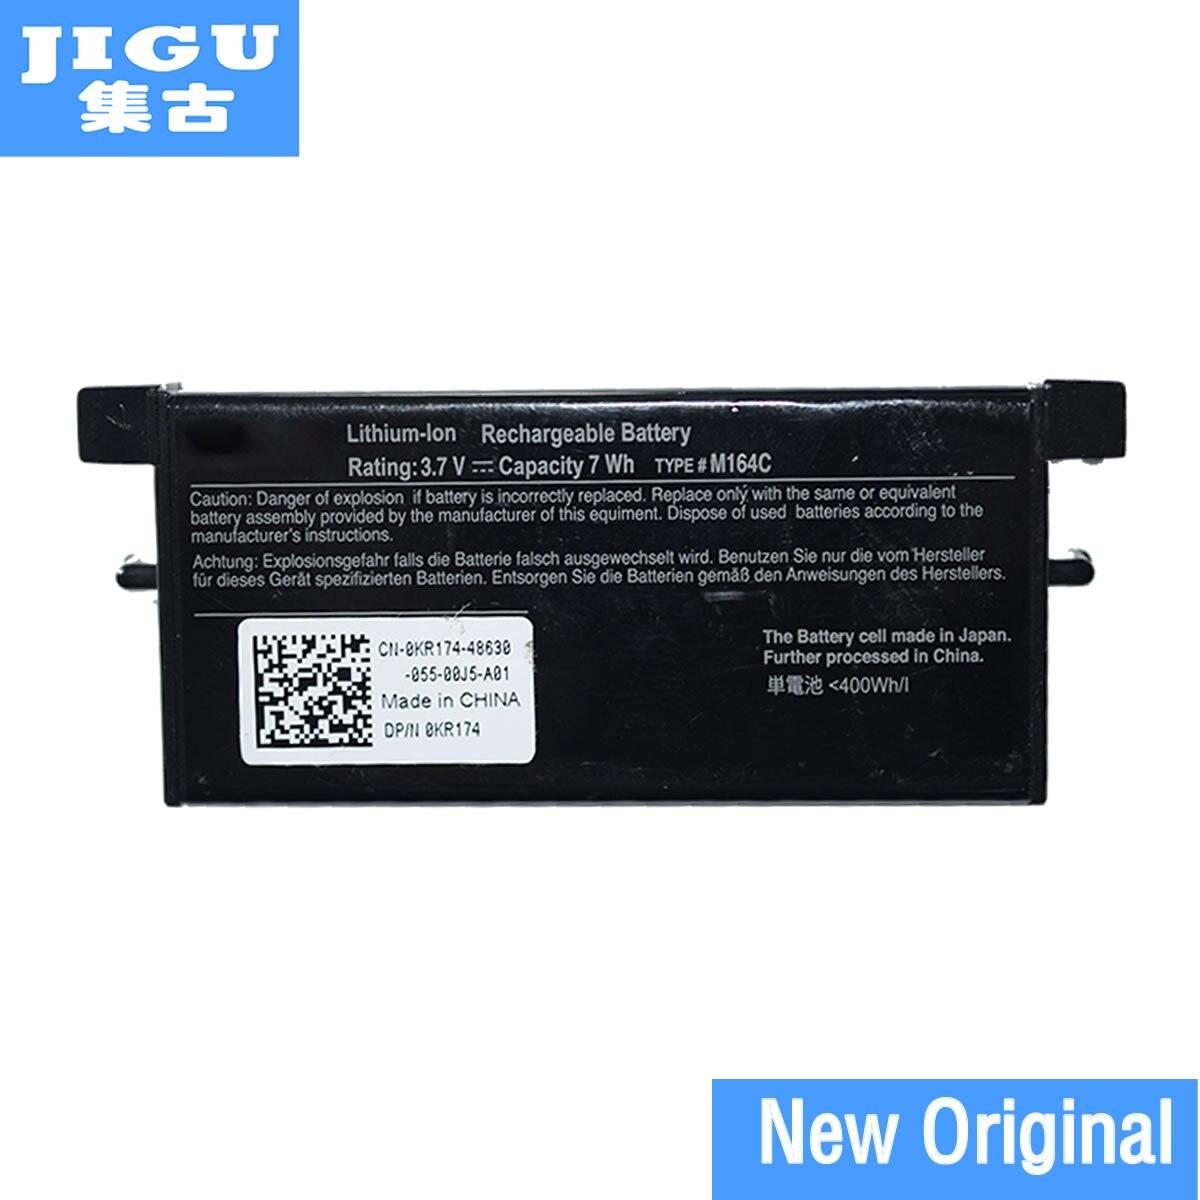 JIGU-بطارية الكمبيوتر المحمول الأصلية GC9R0 KR174 M164C M9602 X8483 لجهاز DELL PERC 5/E 6/E H700 H800